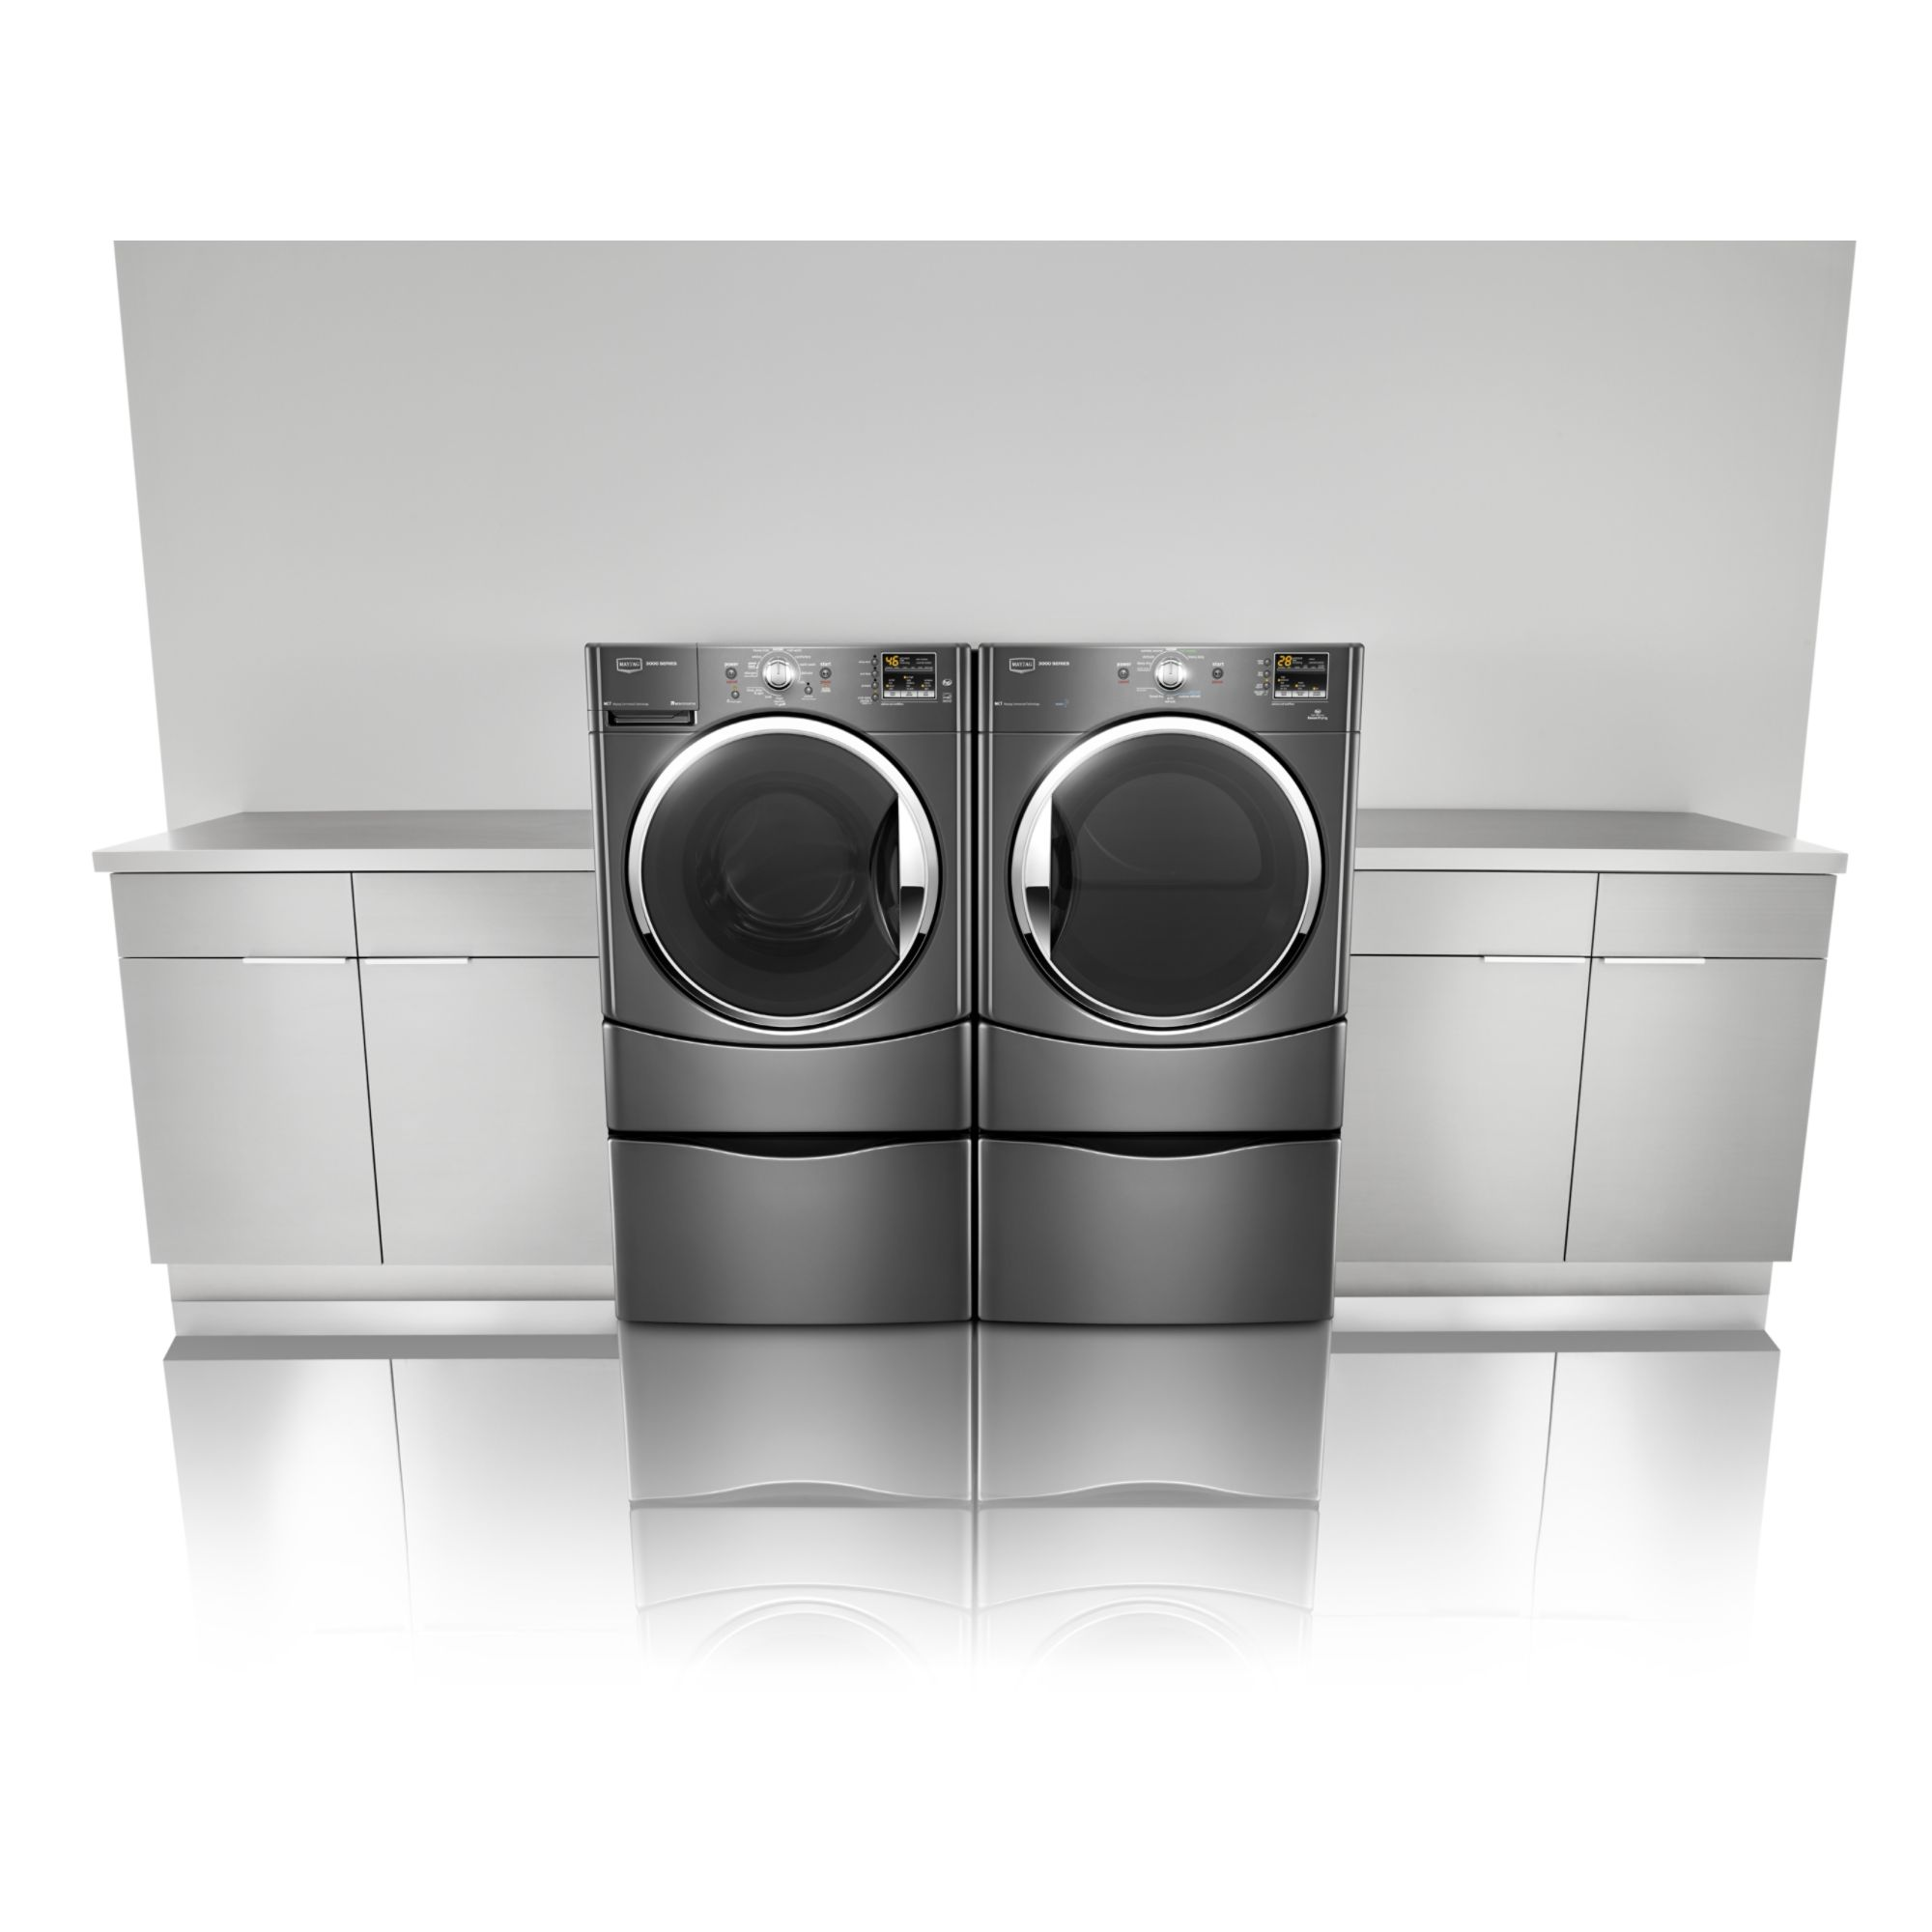 Maytag Front-load Washing Machine 3.5 cubic feet